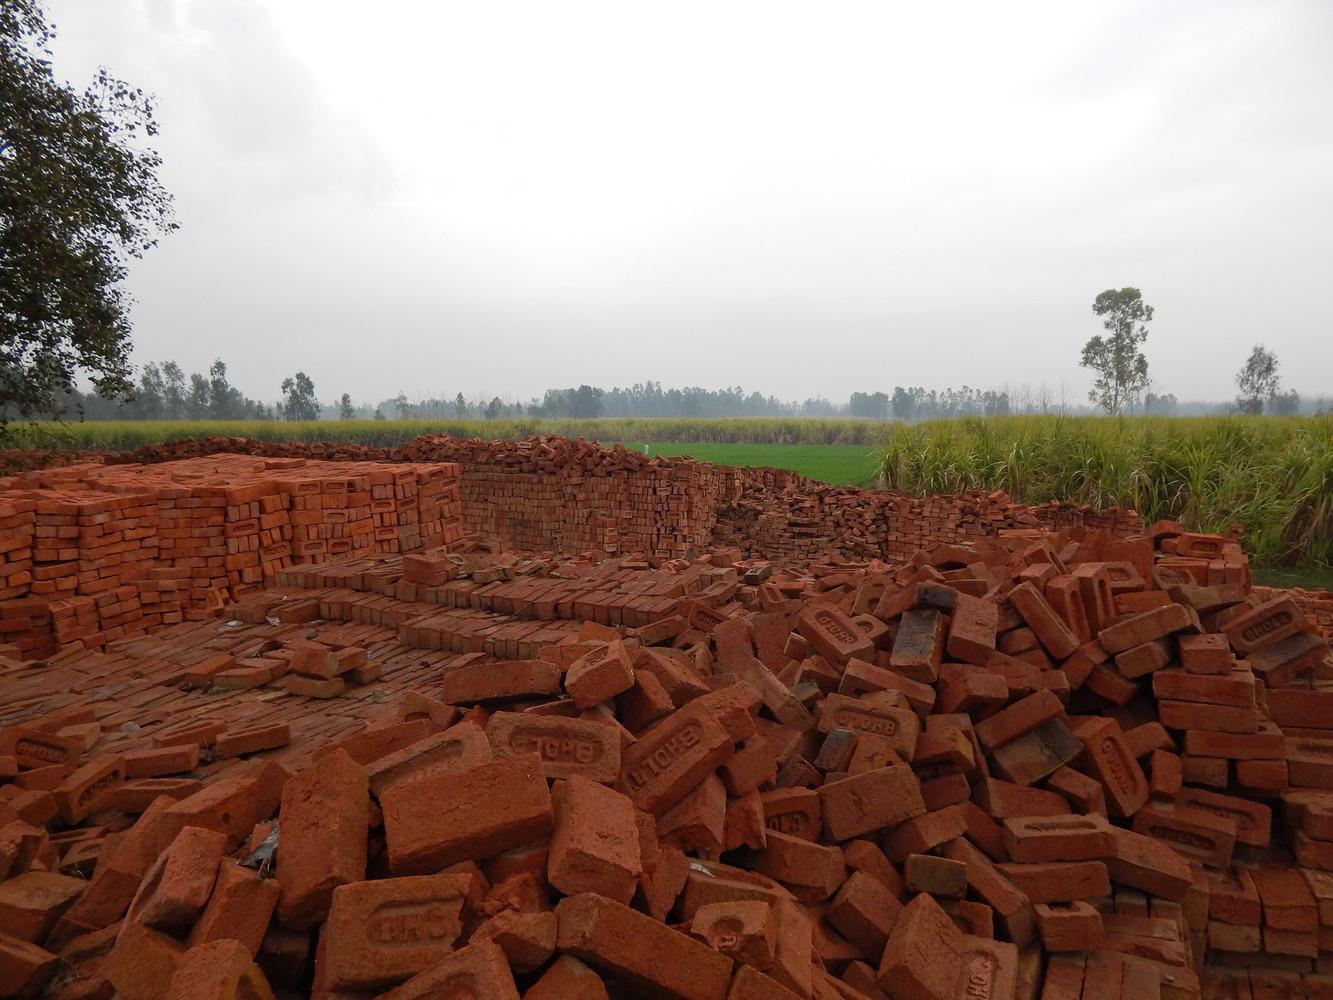 Eco-Blac Bricks. Image Courtesy of MIT Tata Center